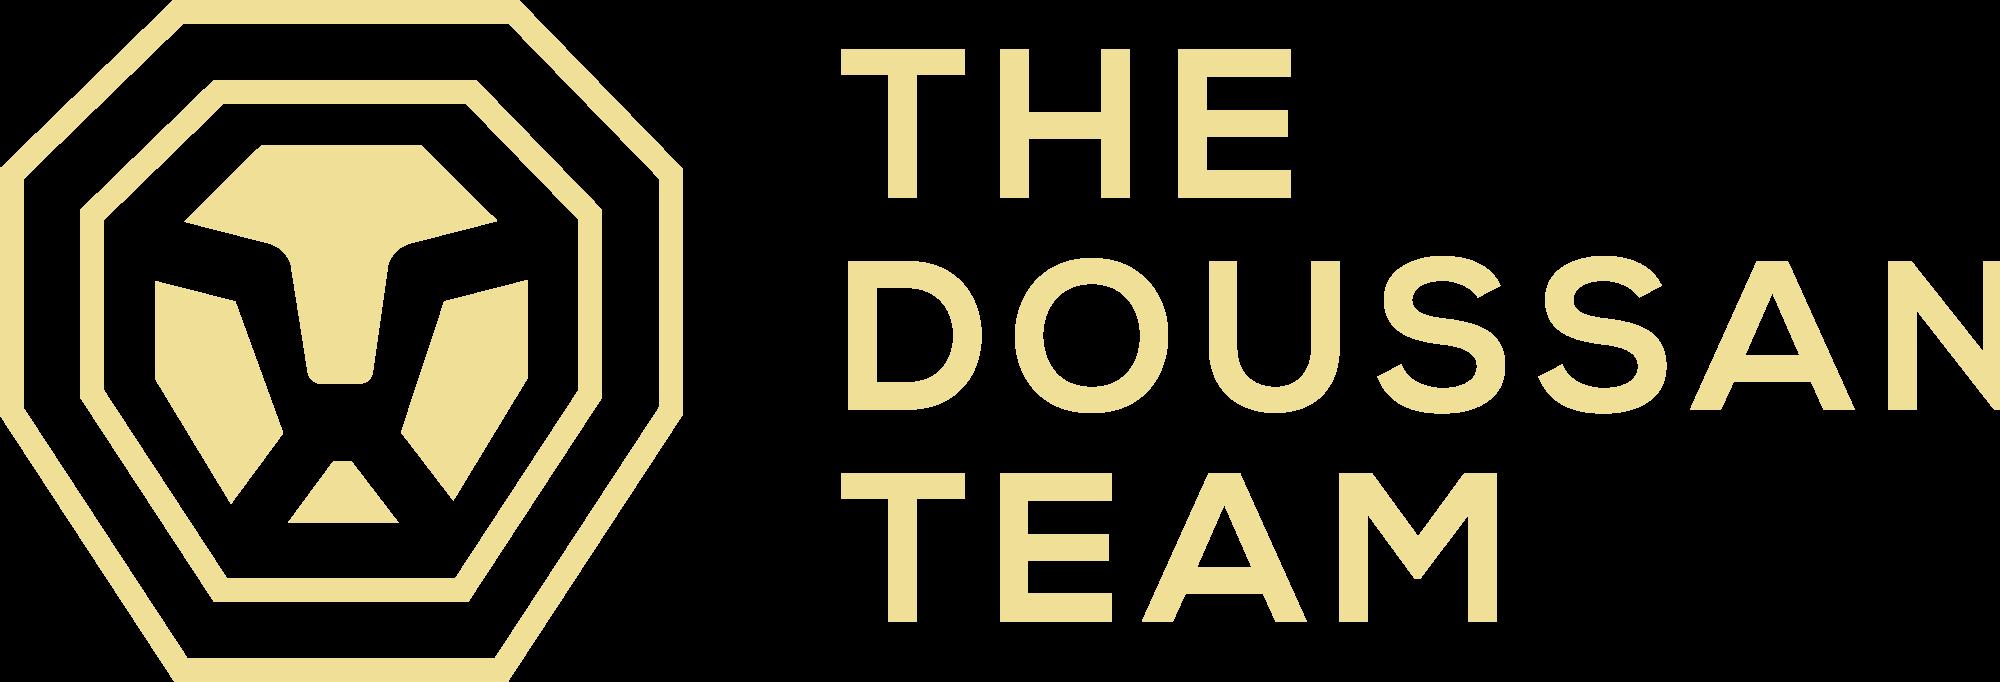 The Doussan Team